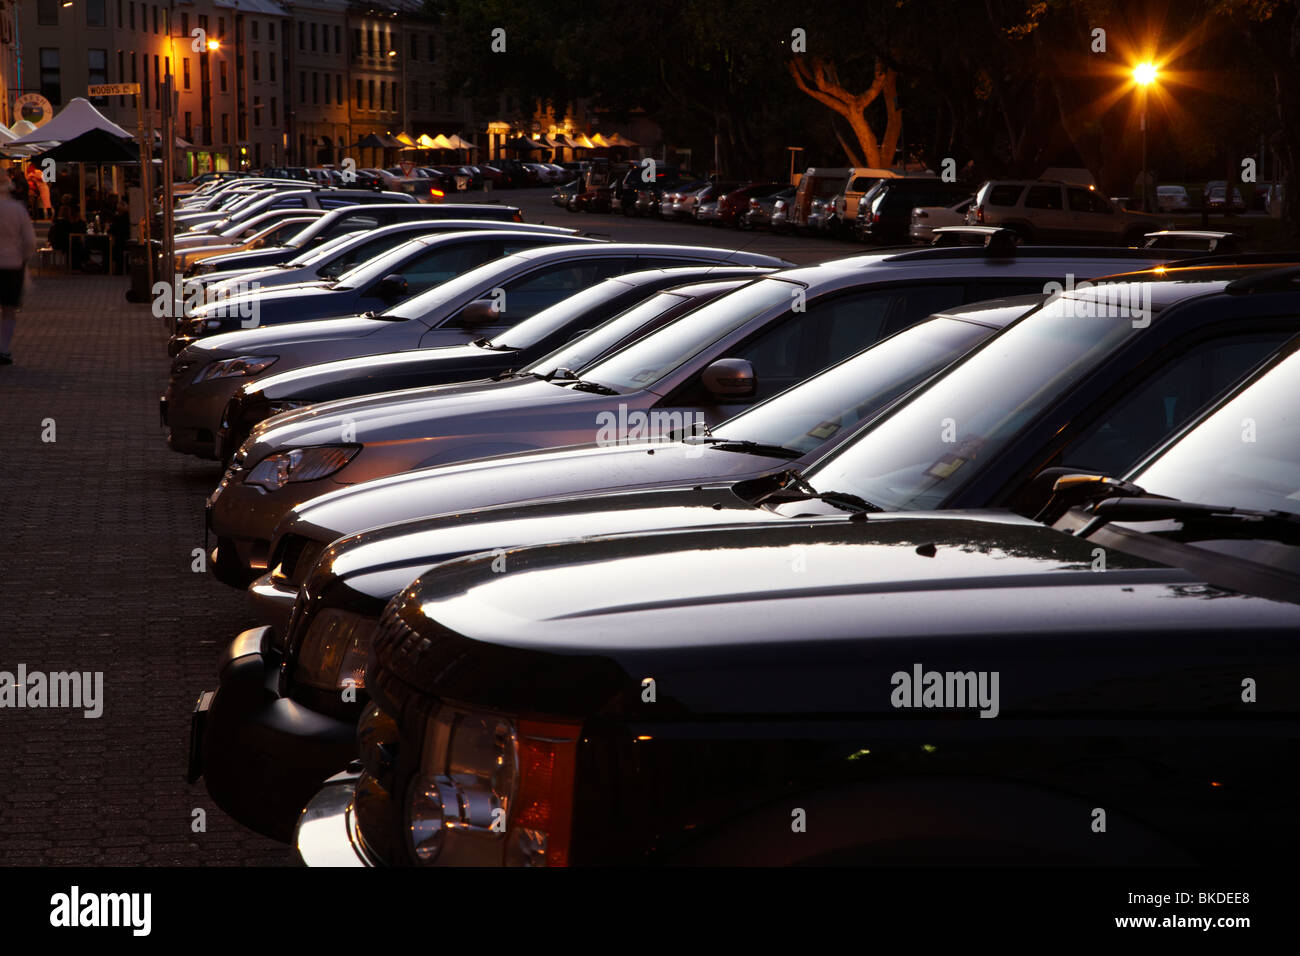 Evening Light on Row of Parked Cars, Salamanca Place, Hobart, Tasmania, Australia - Stock Image